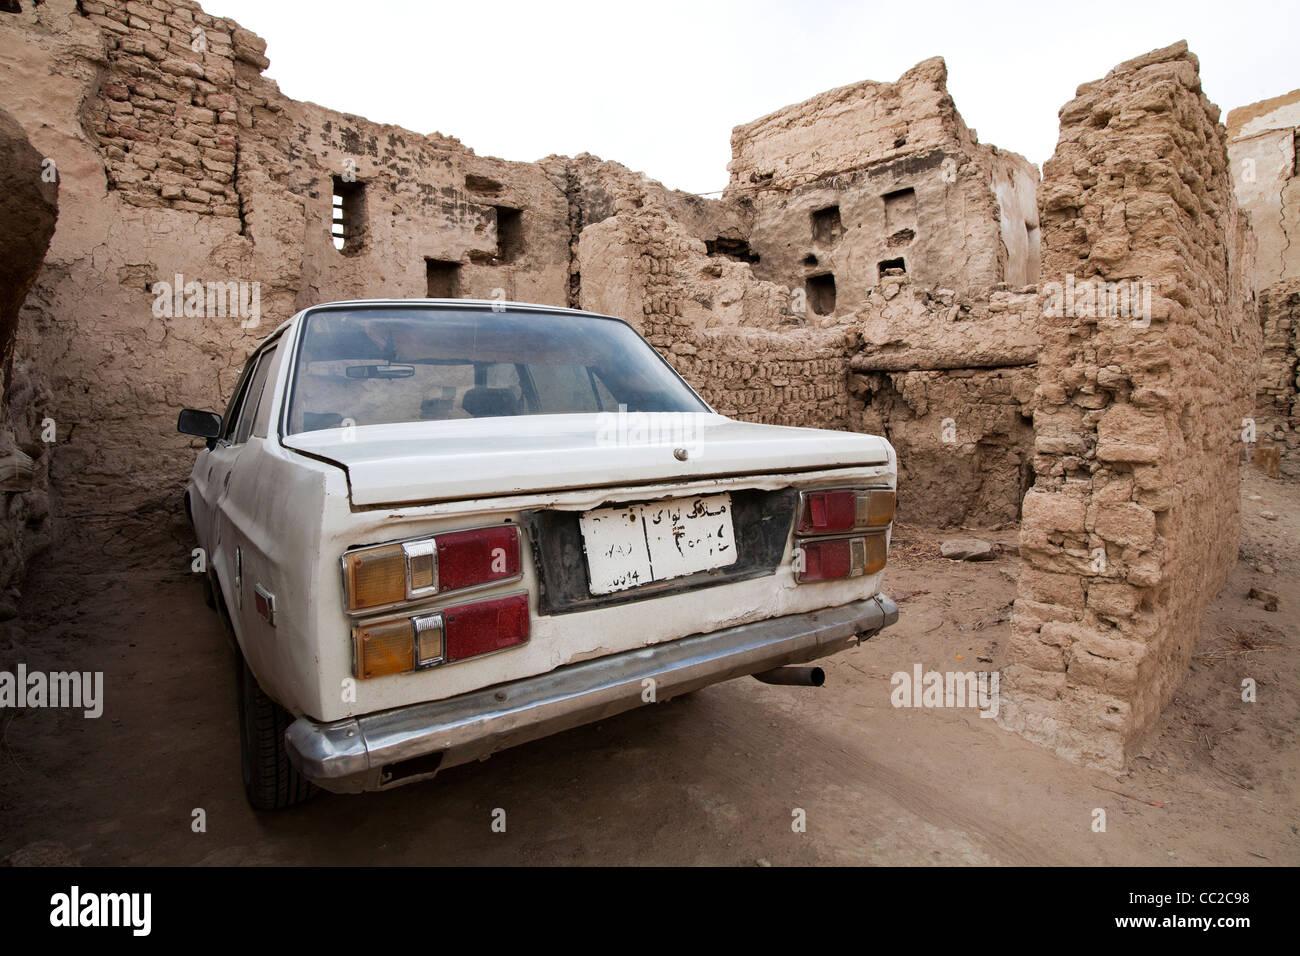 Old car parked in the historic village of El-Qasr at Dakhla Oasis ...